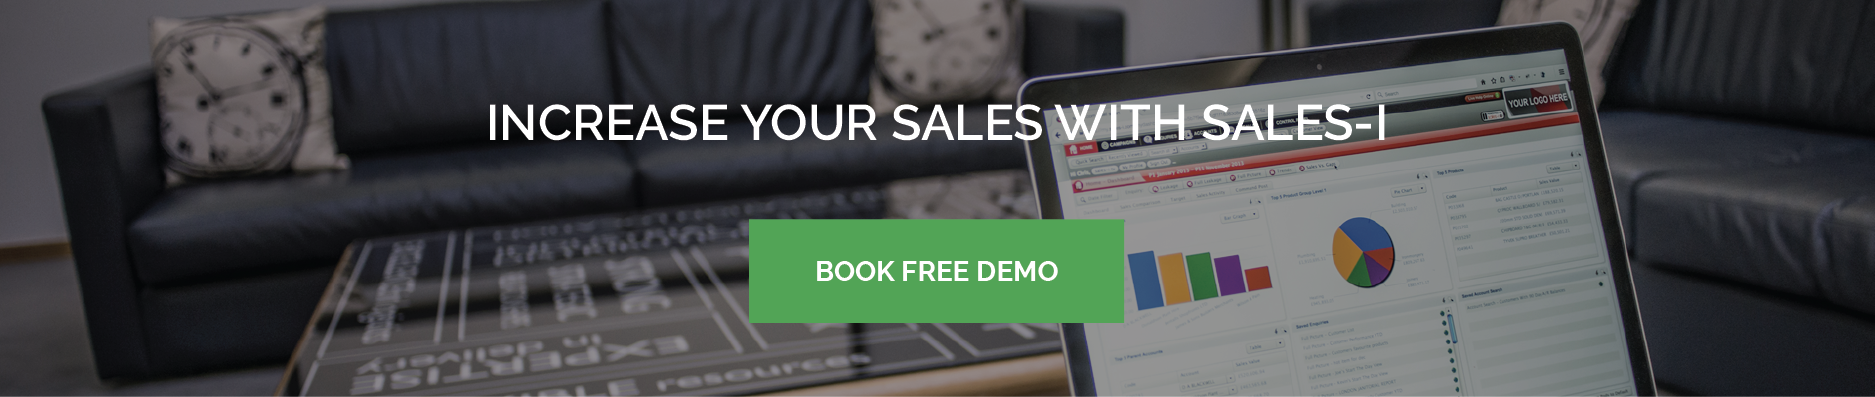 sales-i demo